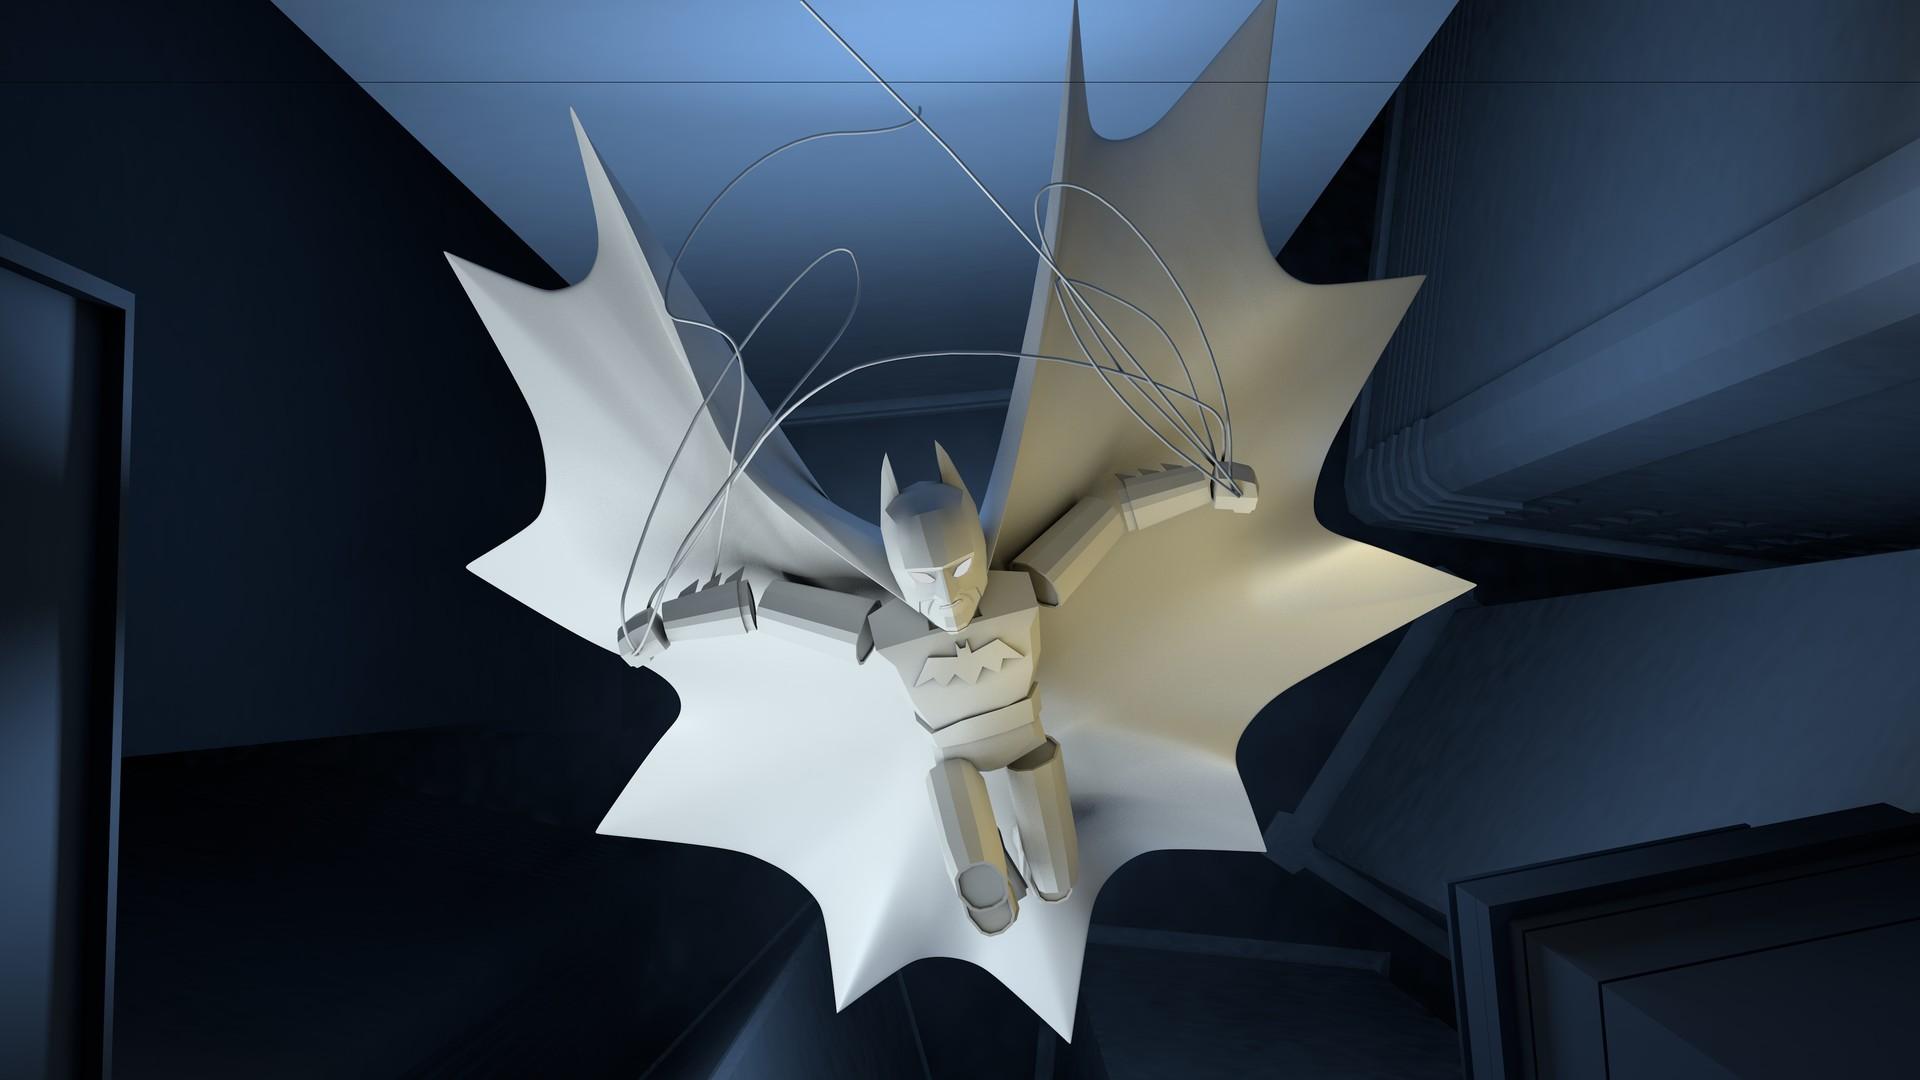 ArtStation - Batman The Dark Knight Low Poly Action Pose